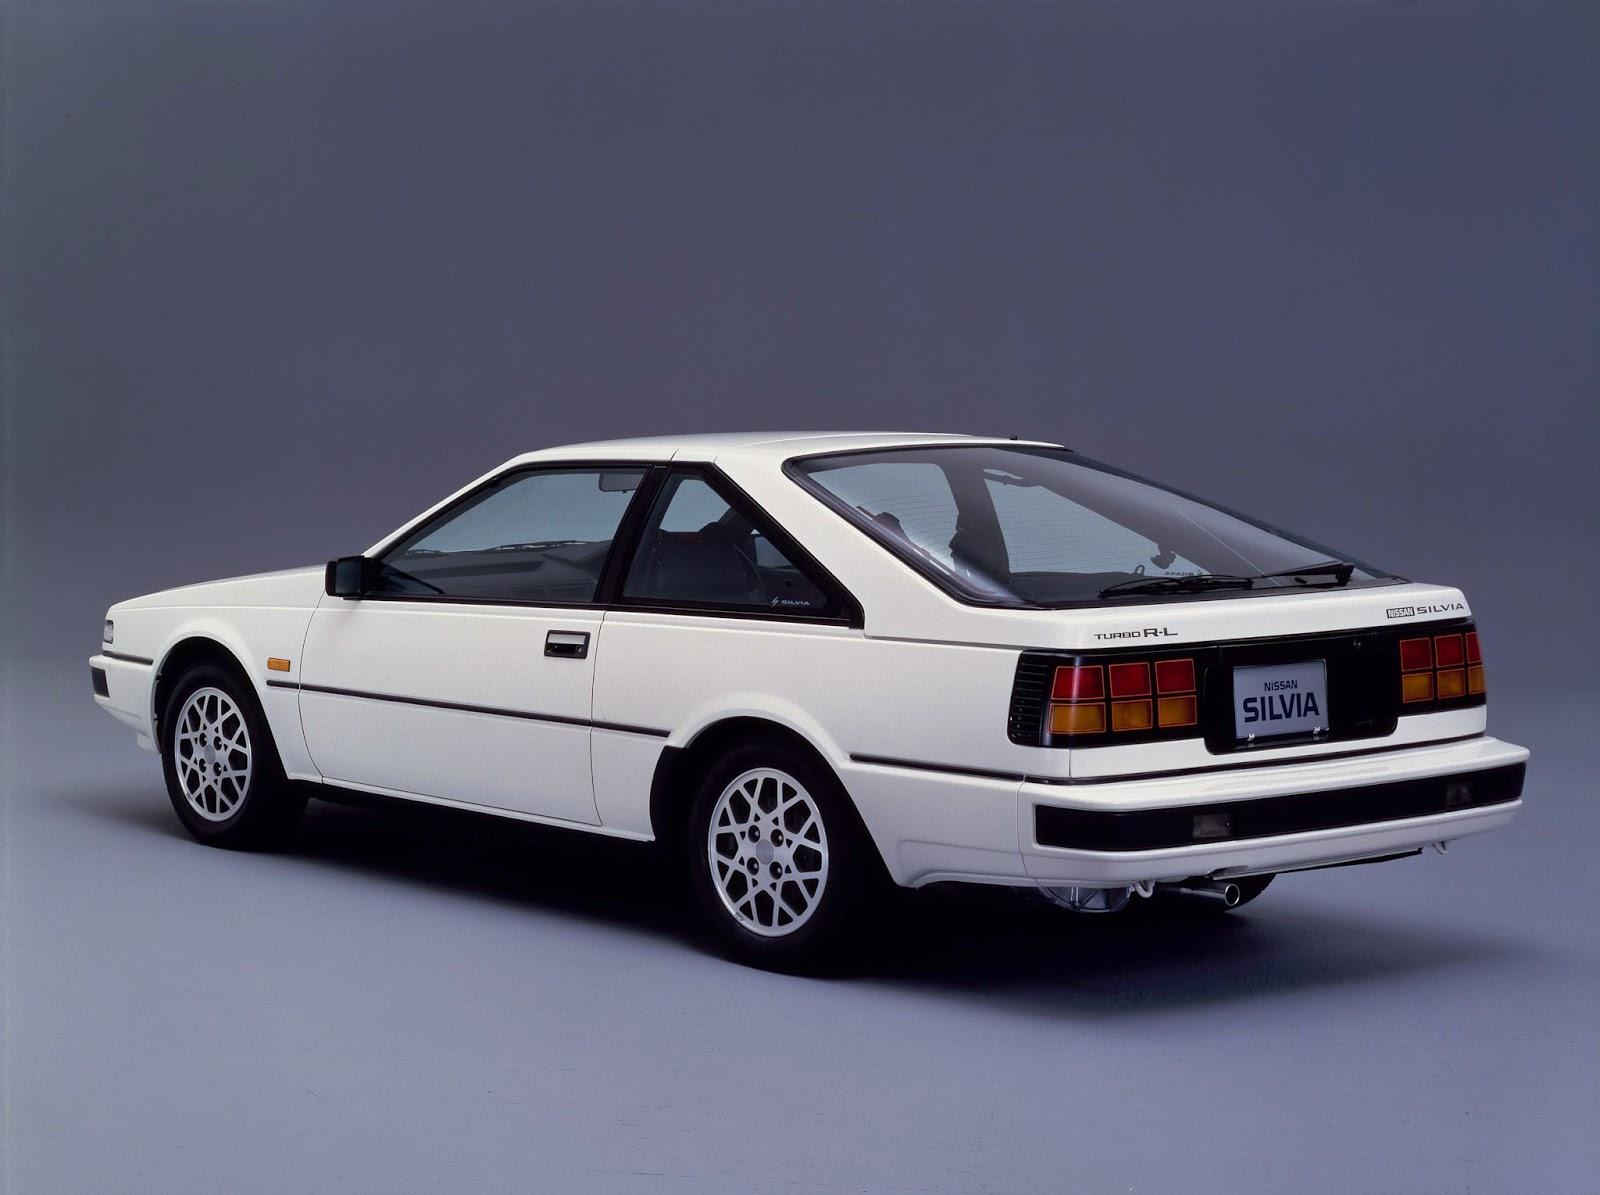 83-87 Nissan 200sx/Gazelle/Silvia (s12)